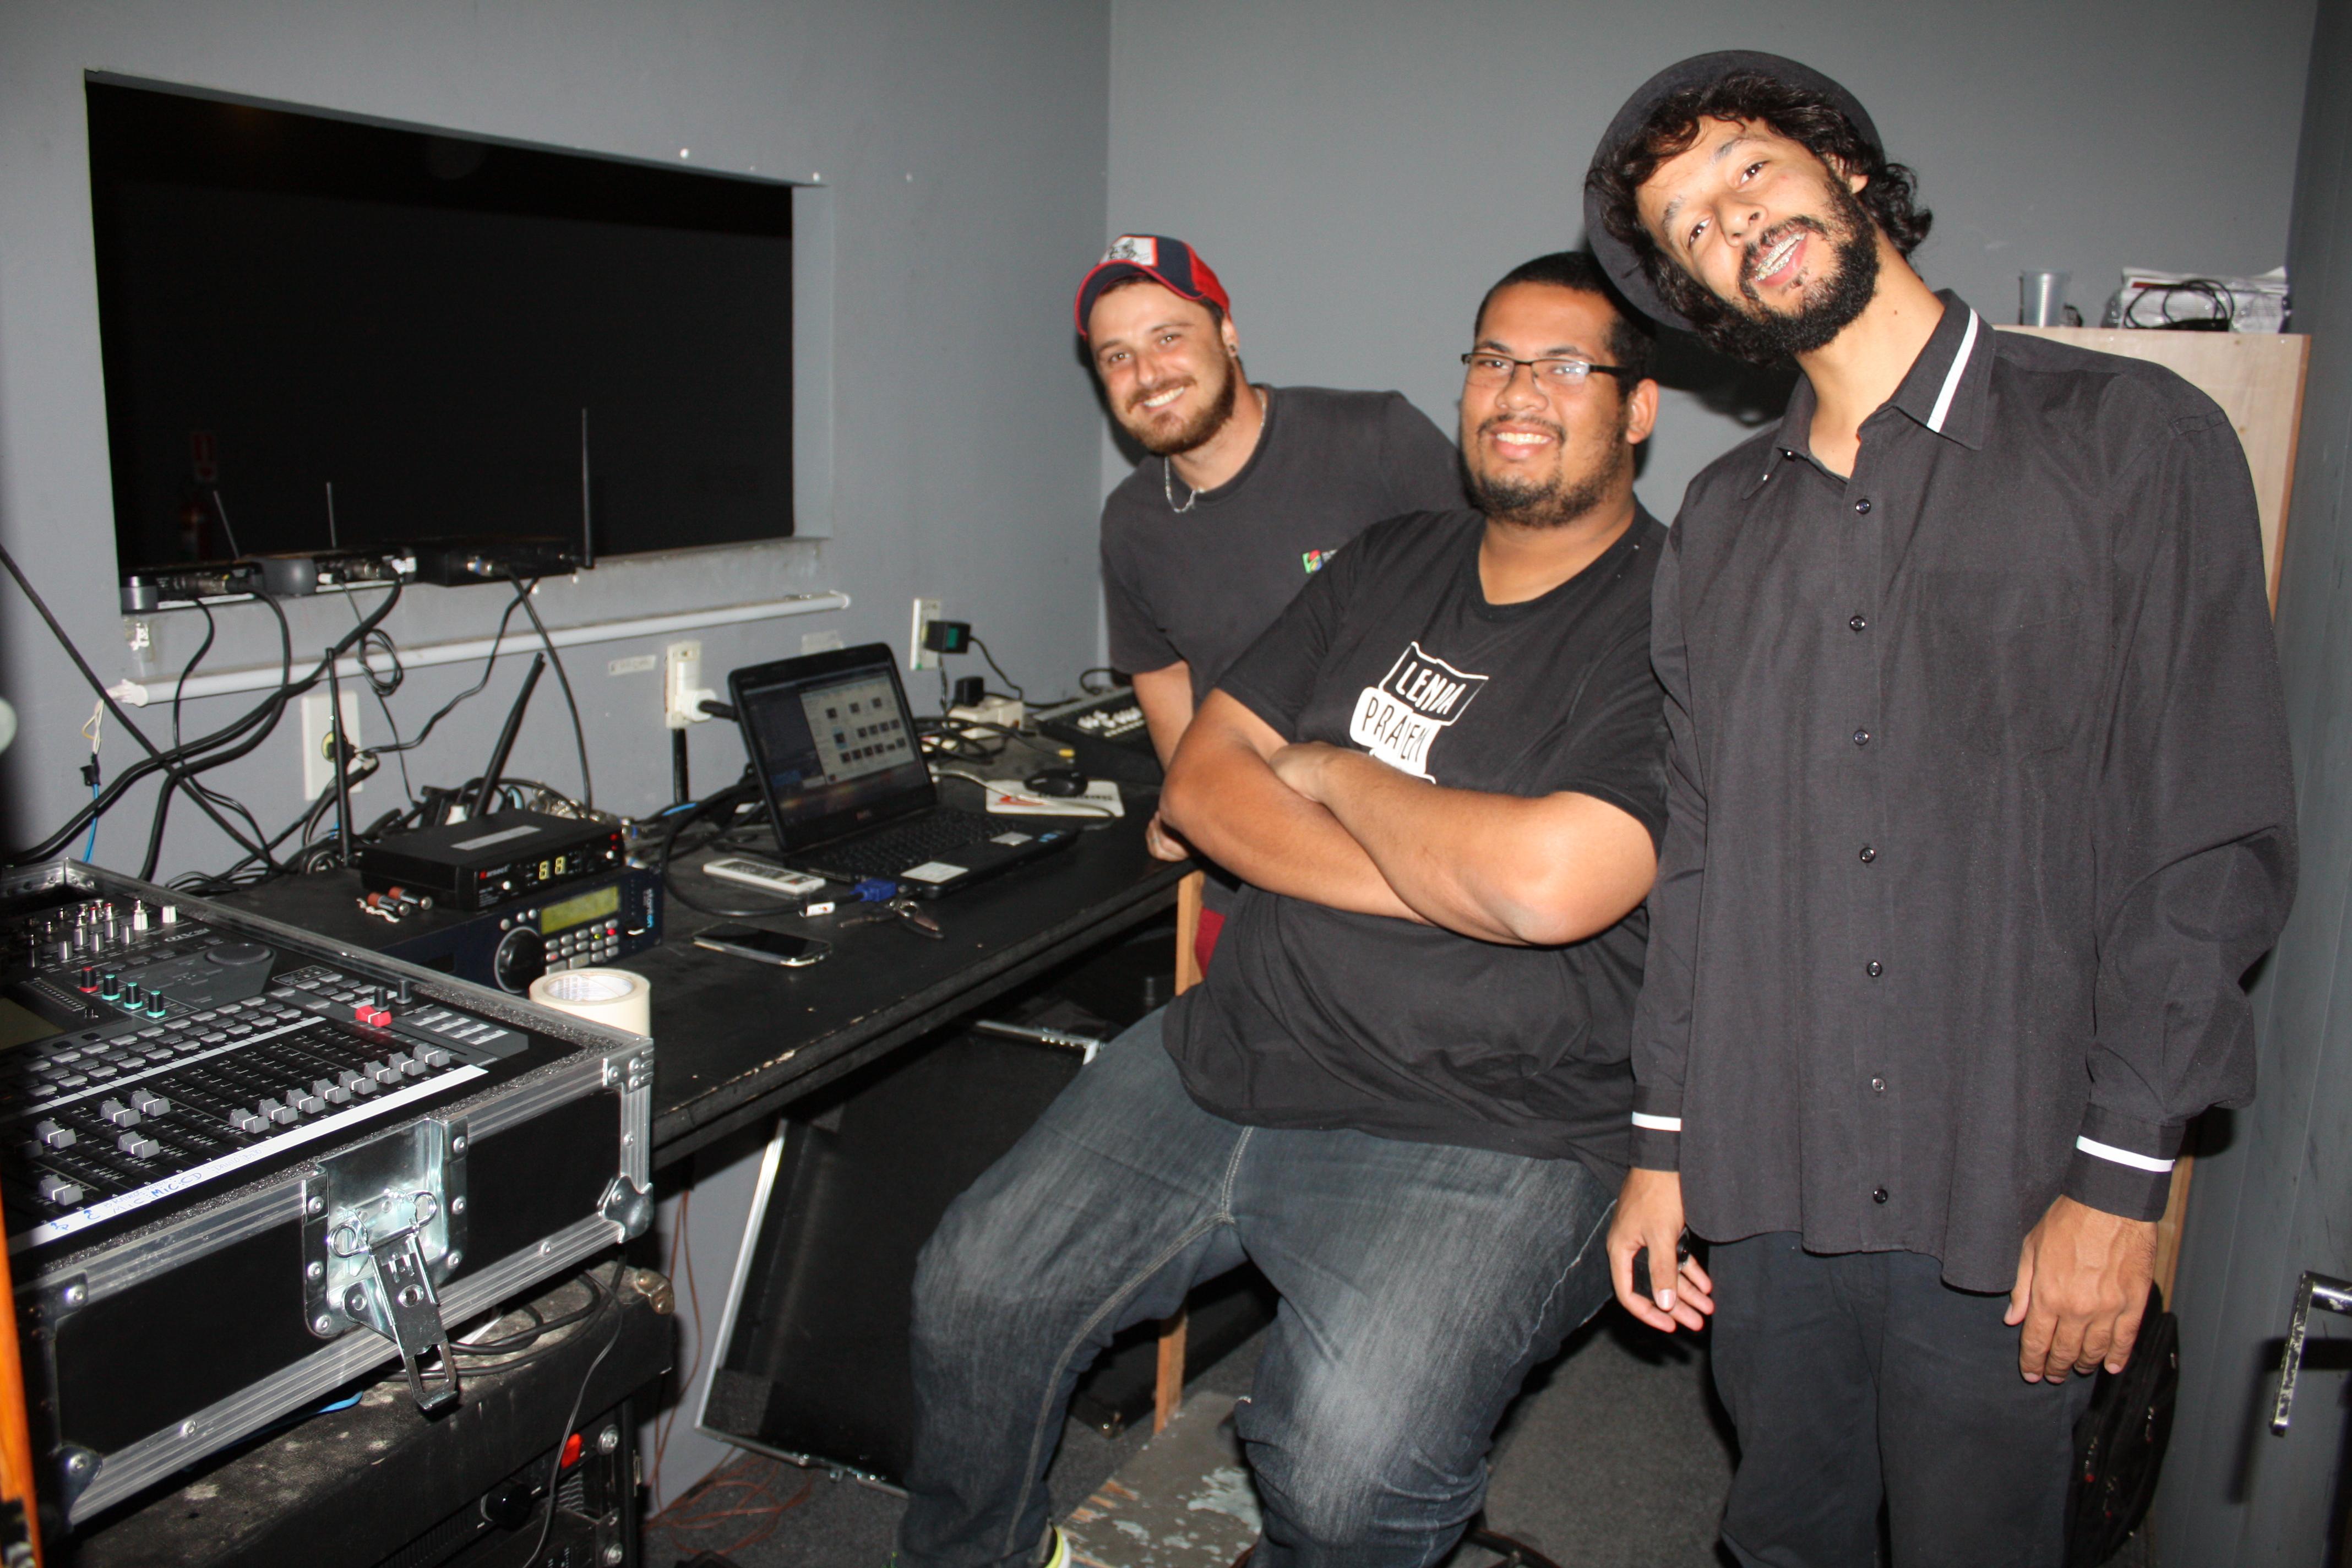 Equipe técnica do FESTICINI - Helton Barros, Felipe Pereira da Silva e Fernando Tognon